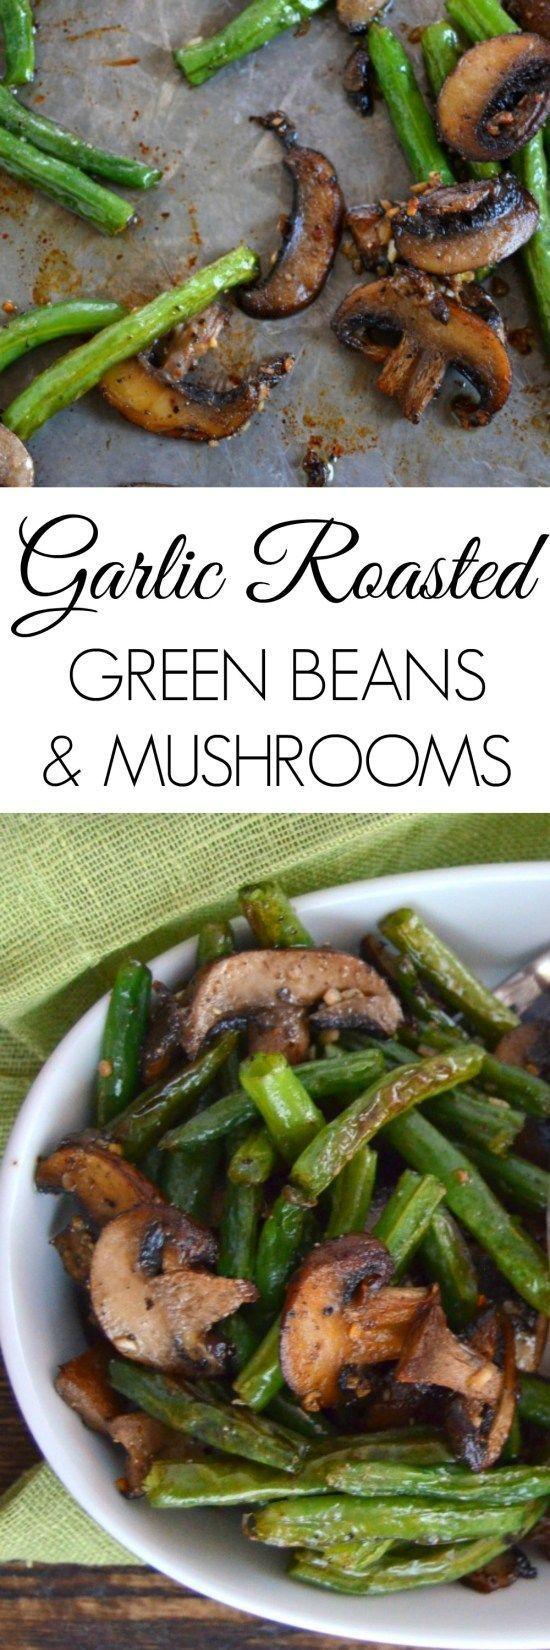 Garlic Roasted Green Beans and Mushrooms – Healthy Side Dish – Roasted Vegetables – Roasted Vegetables Oven – Roasted Vegetables